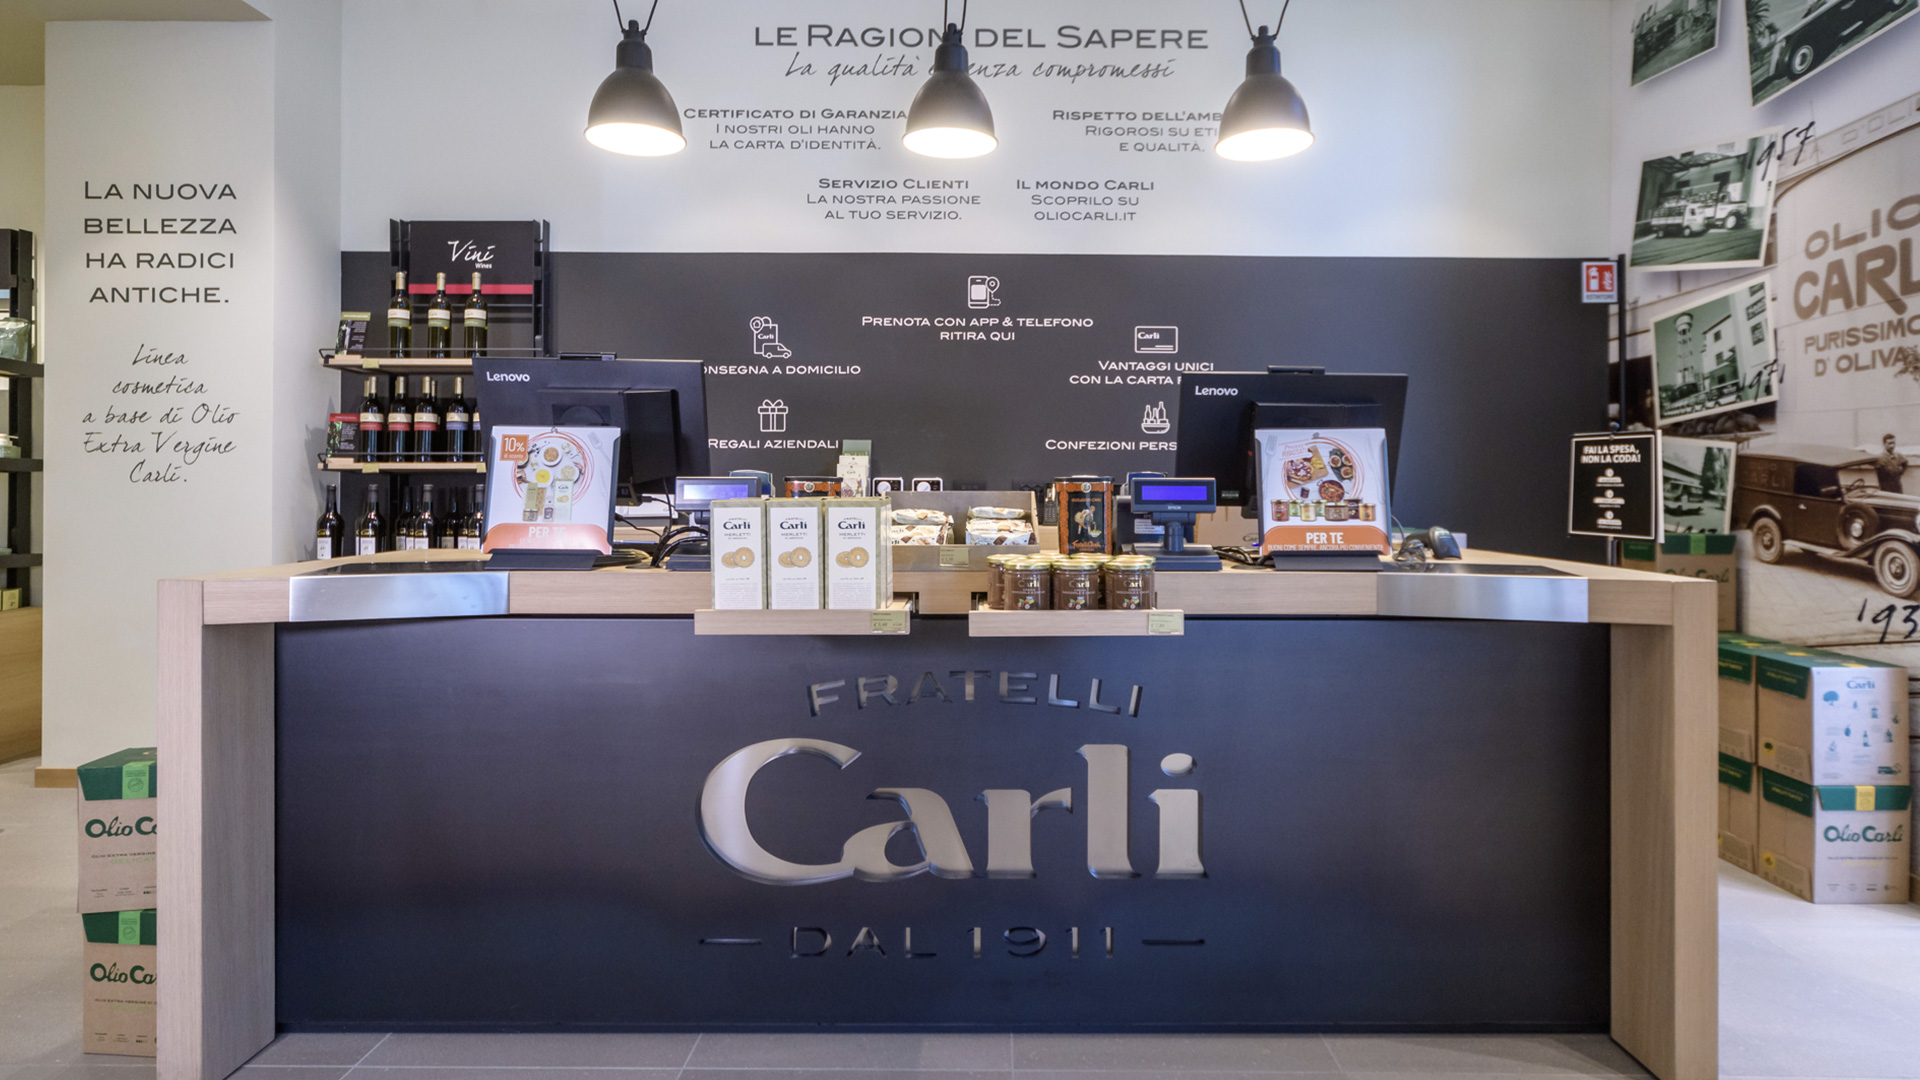 Olio-Carli-Rba-Design-003